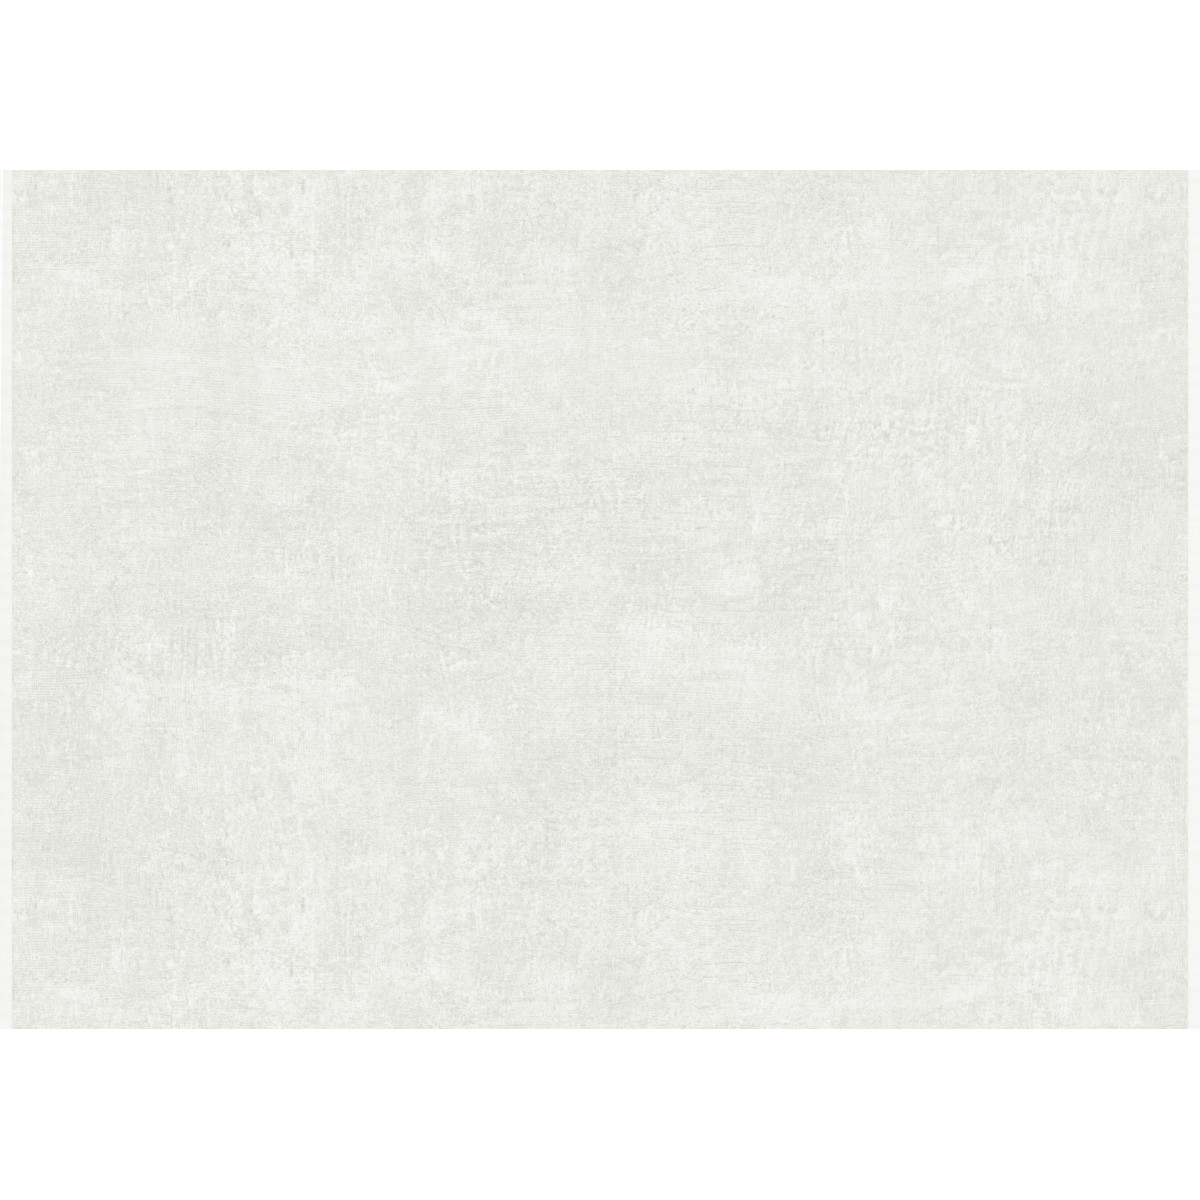 Обои флизелиновые Prima Italiana Poema белые 1.06 м 20832